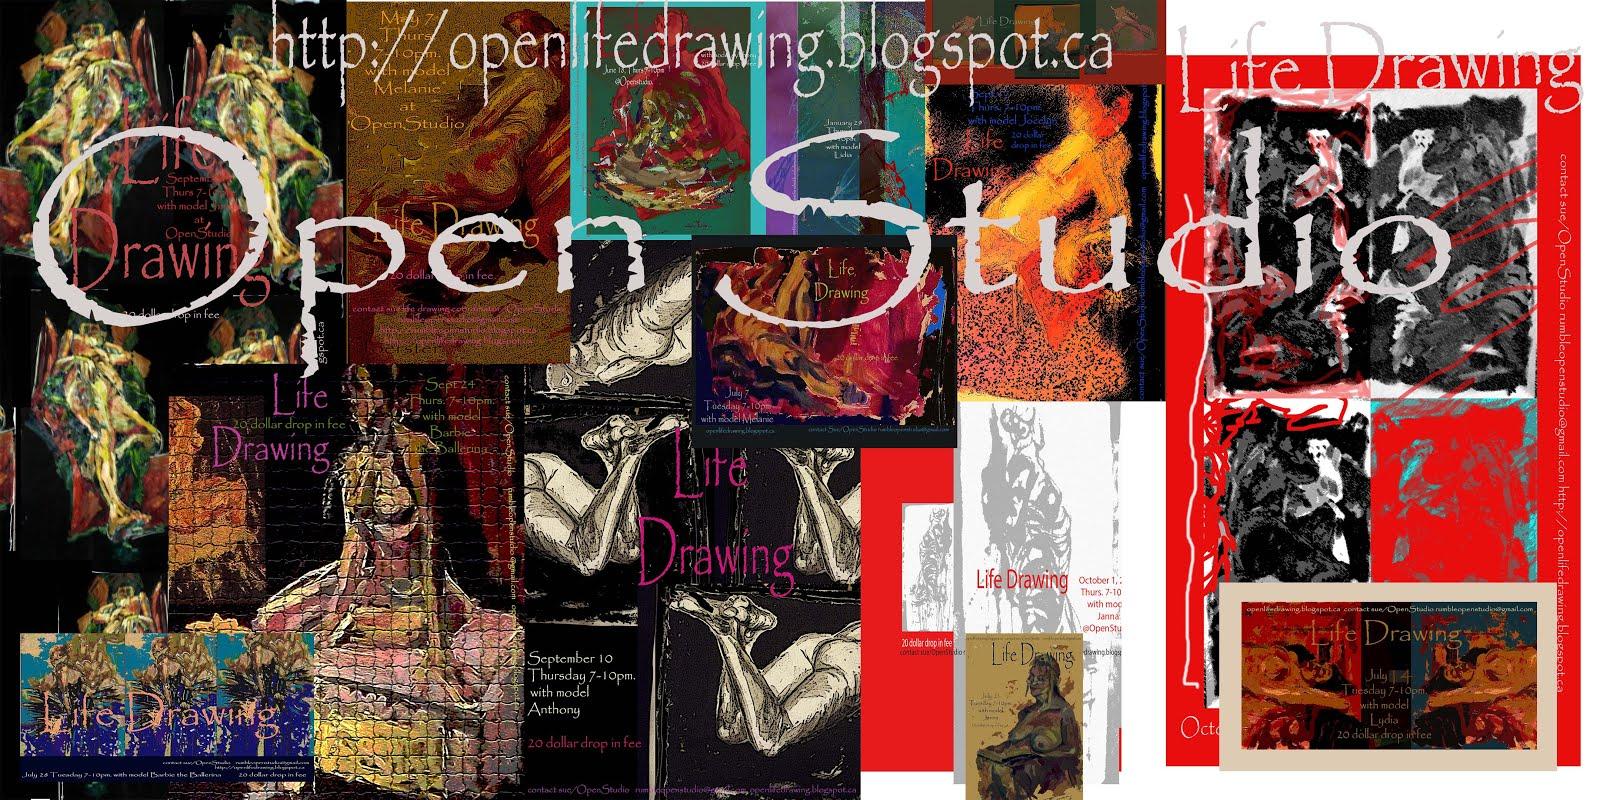 OpenStudio Life Drawing